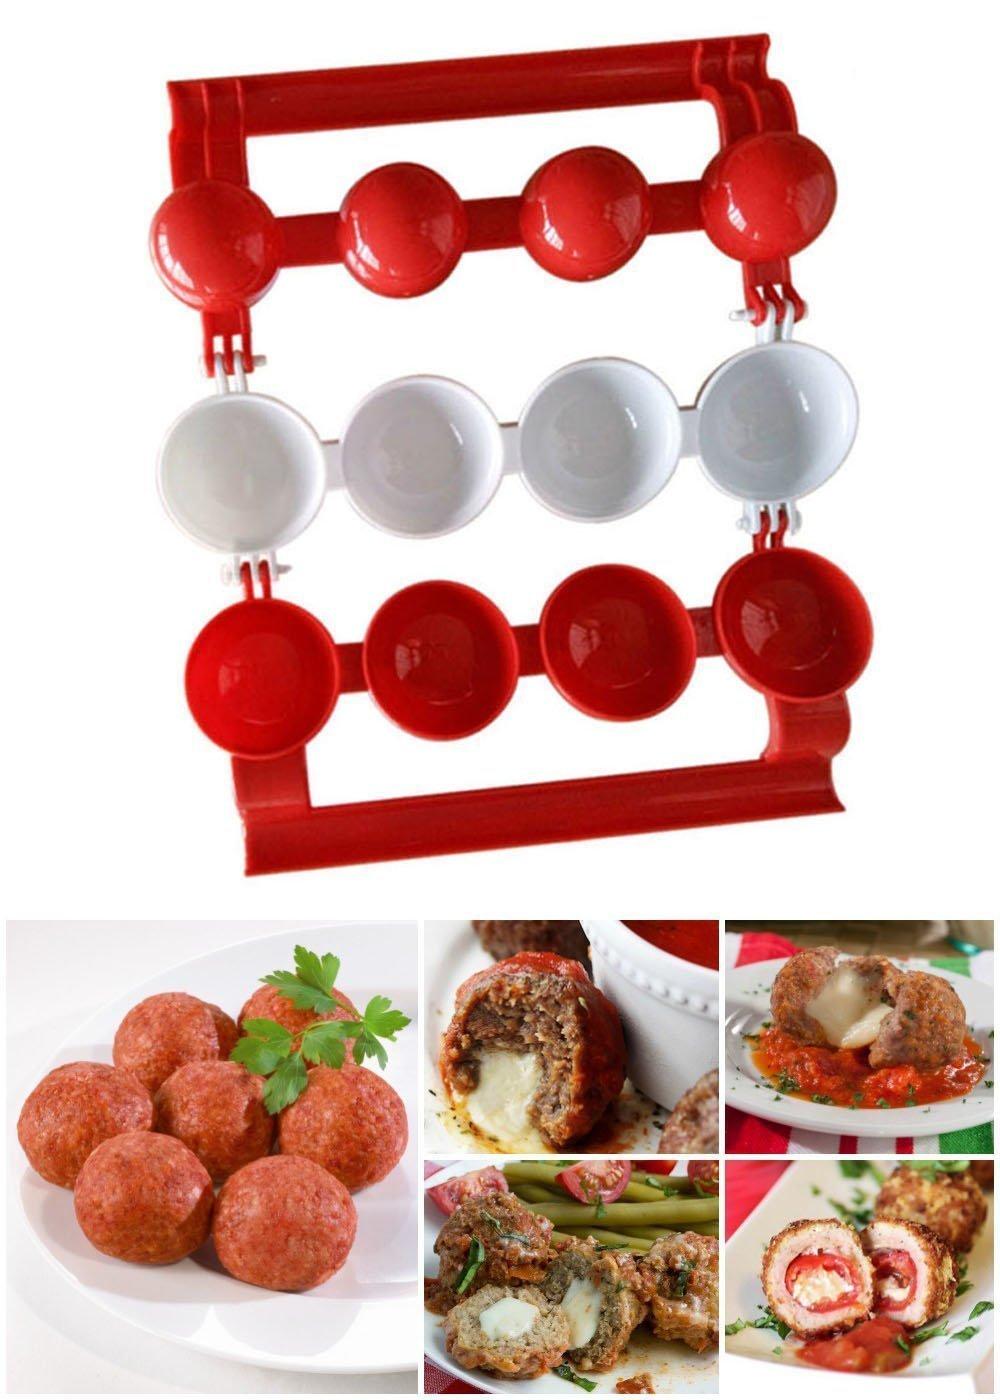 CSMARTE Meatballs Maker Meatball BPA Free Kitchen Maker Pro Homemade Stuffed Meat Balls Maker